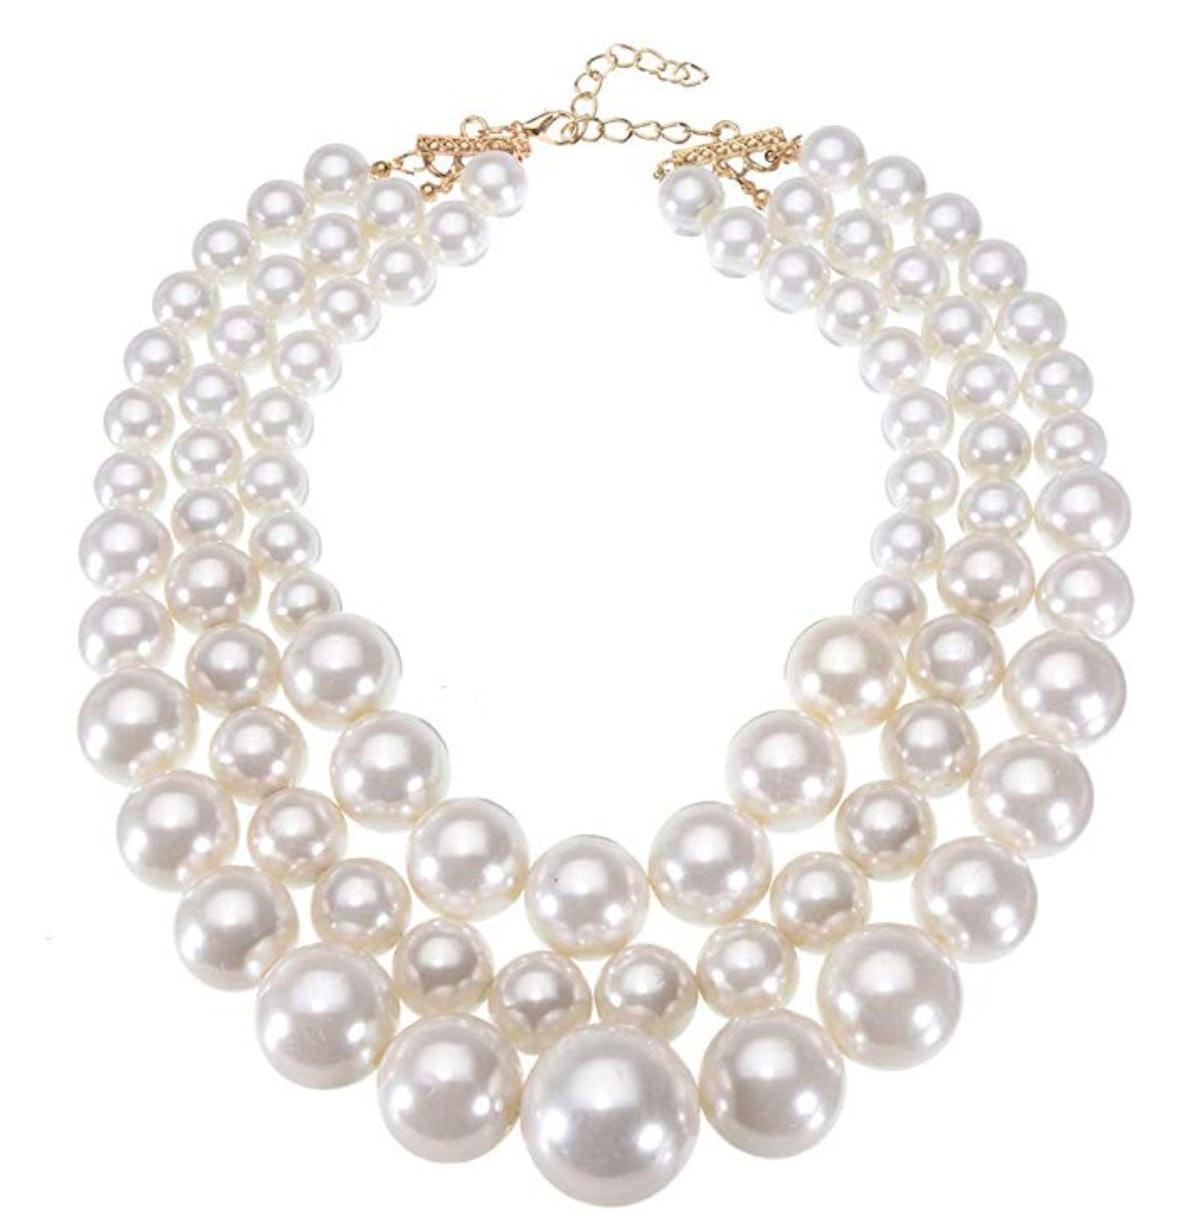 Jerollin Fashion Jewelry Multi Strand Simulated Pearl Resin Chain Collar Choker